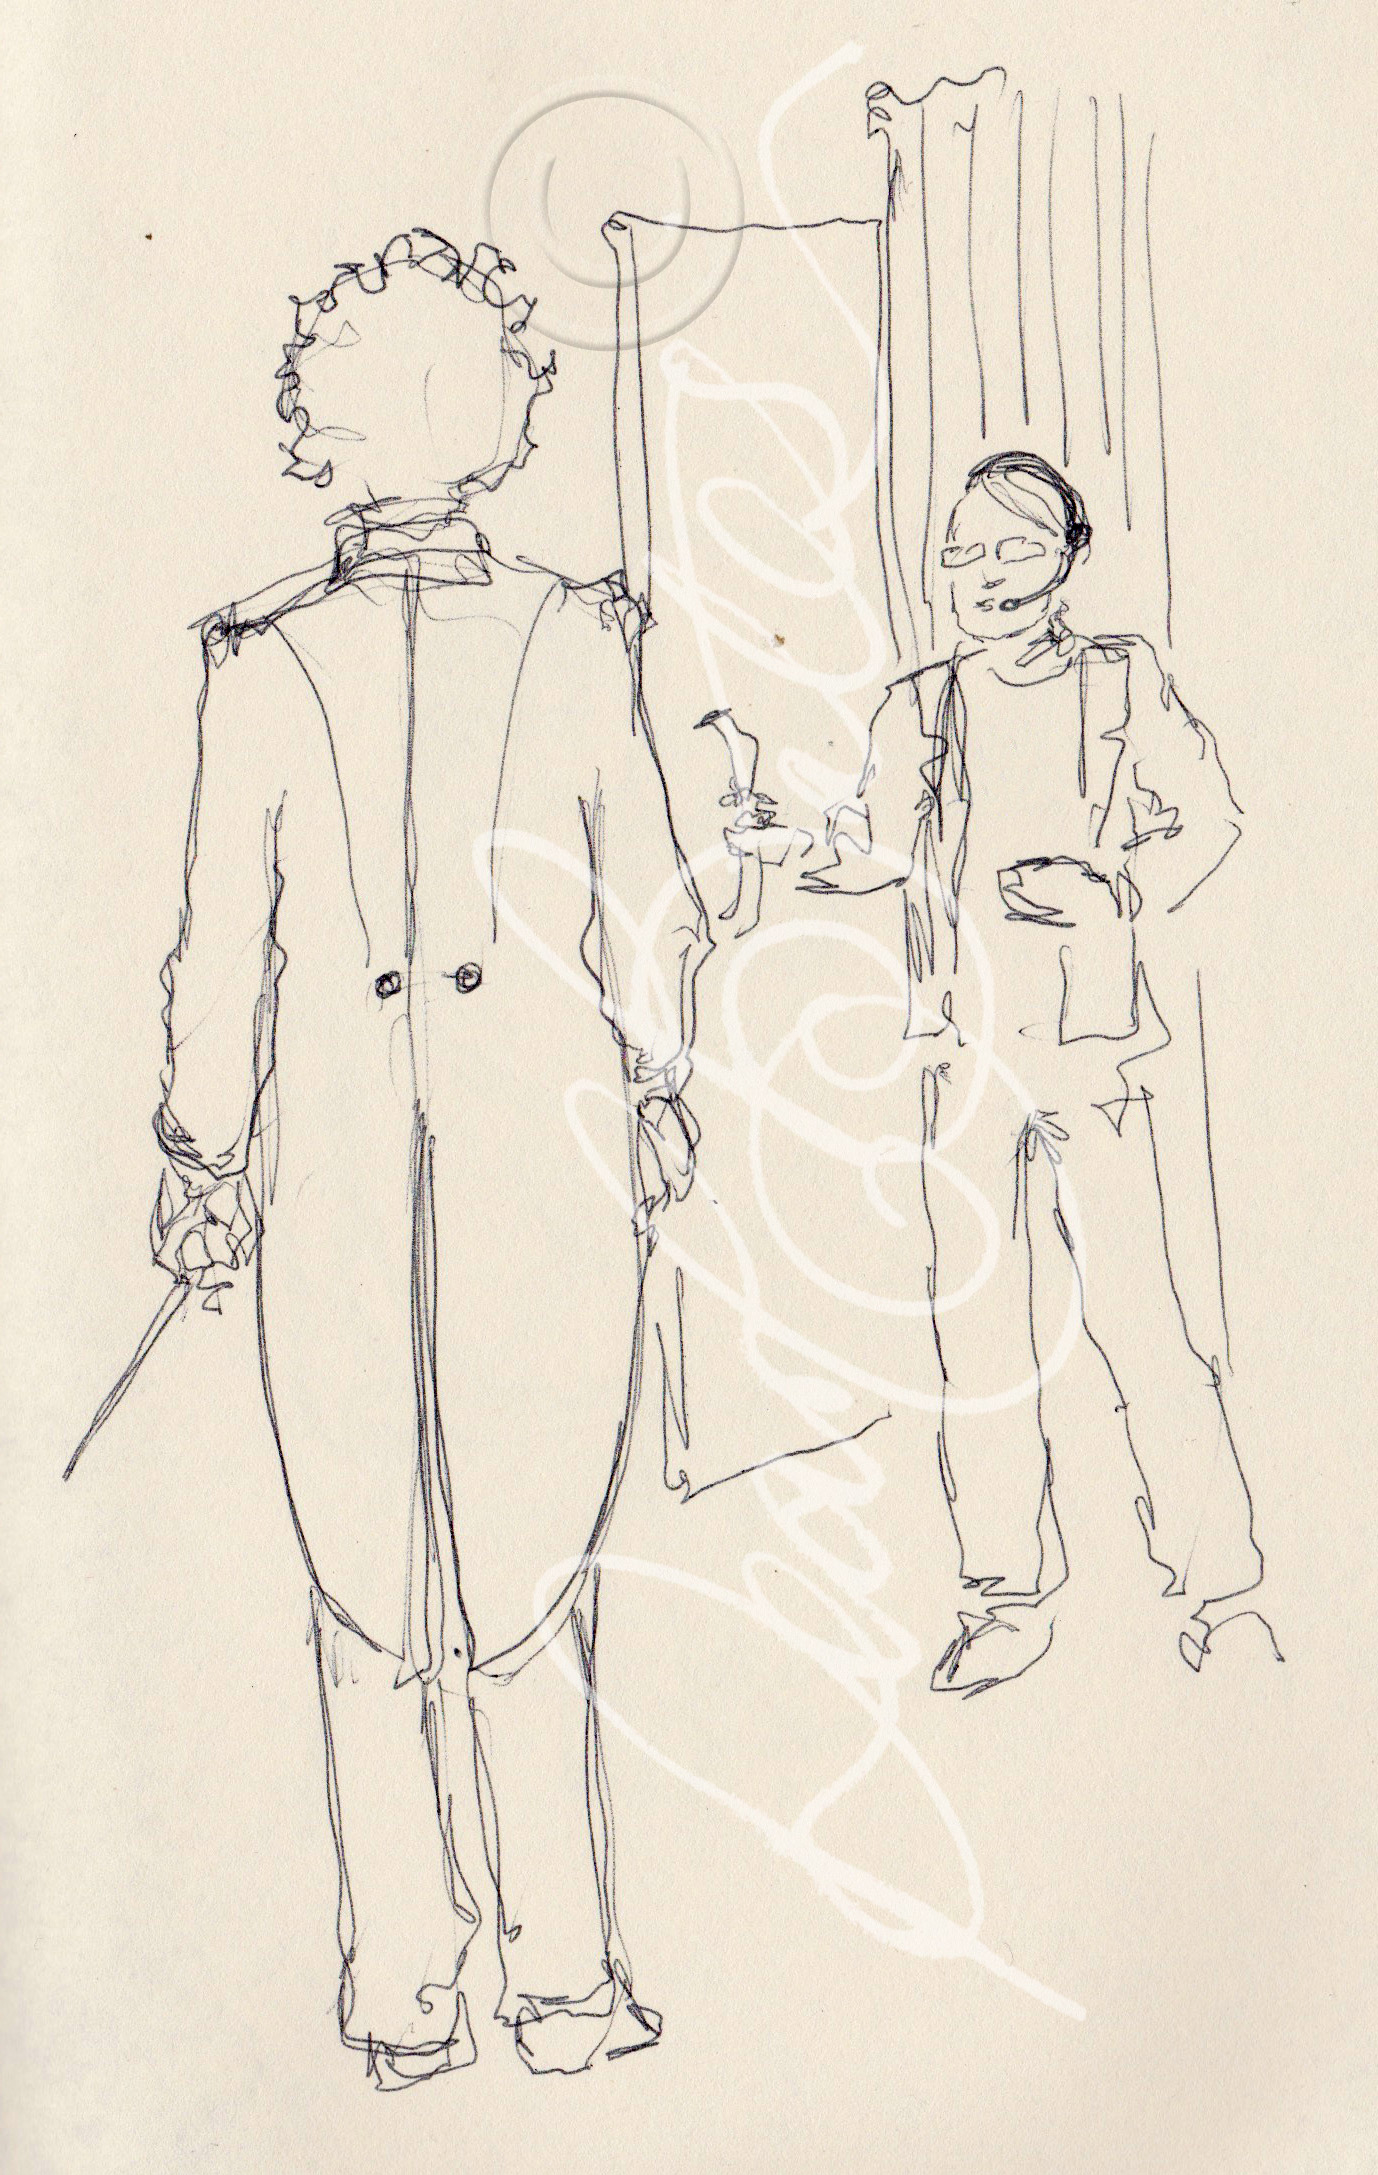 Robin and Tom